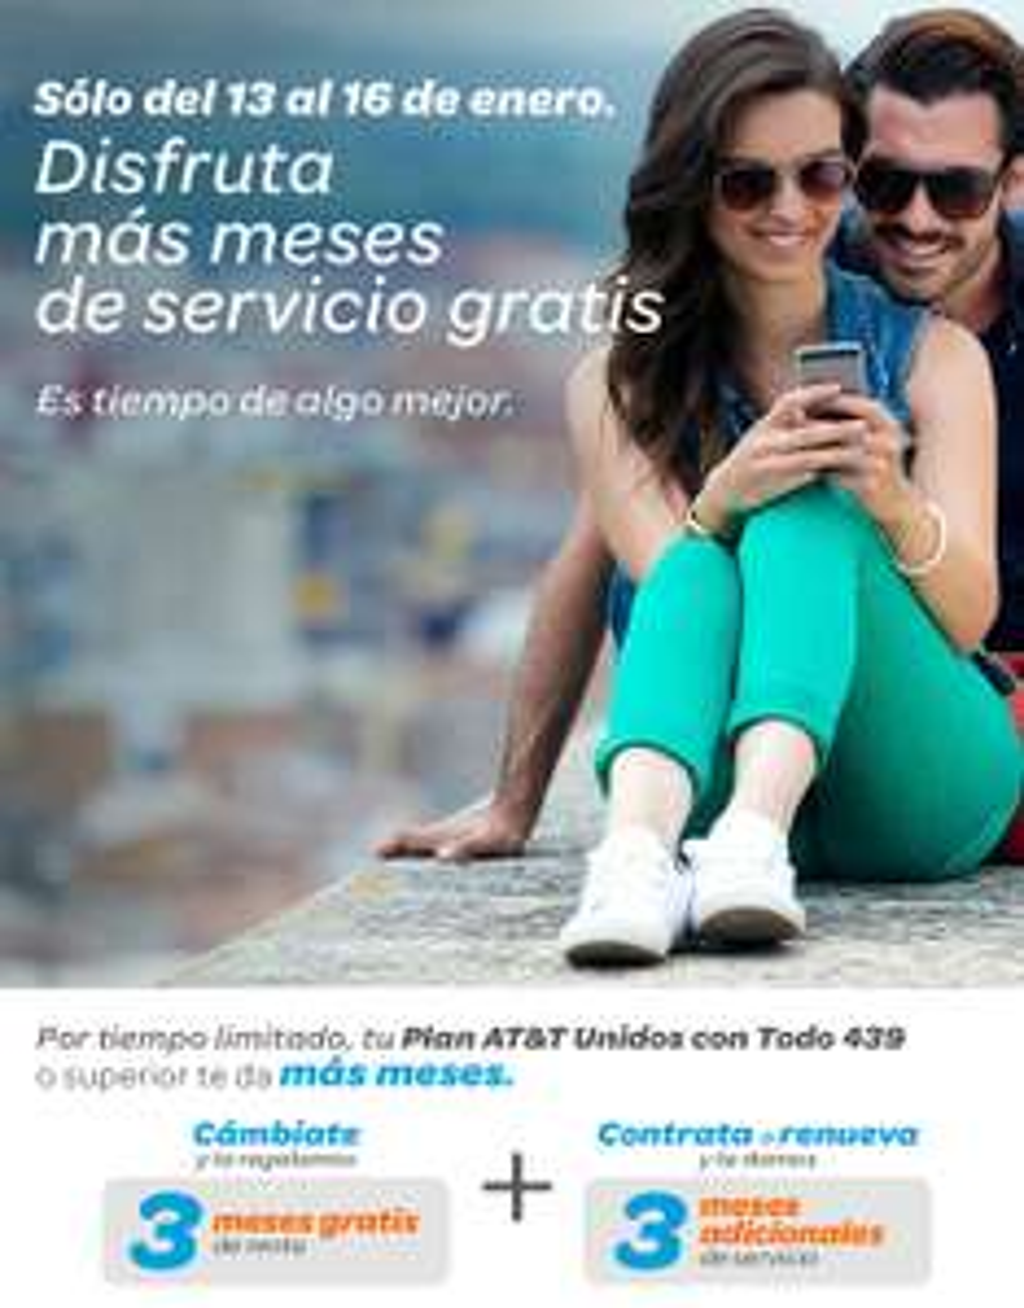 AT&T (Iusacell) 3 Meses Gratis + 3 adicionales en portabilidad. Vence Hoy.